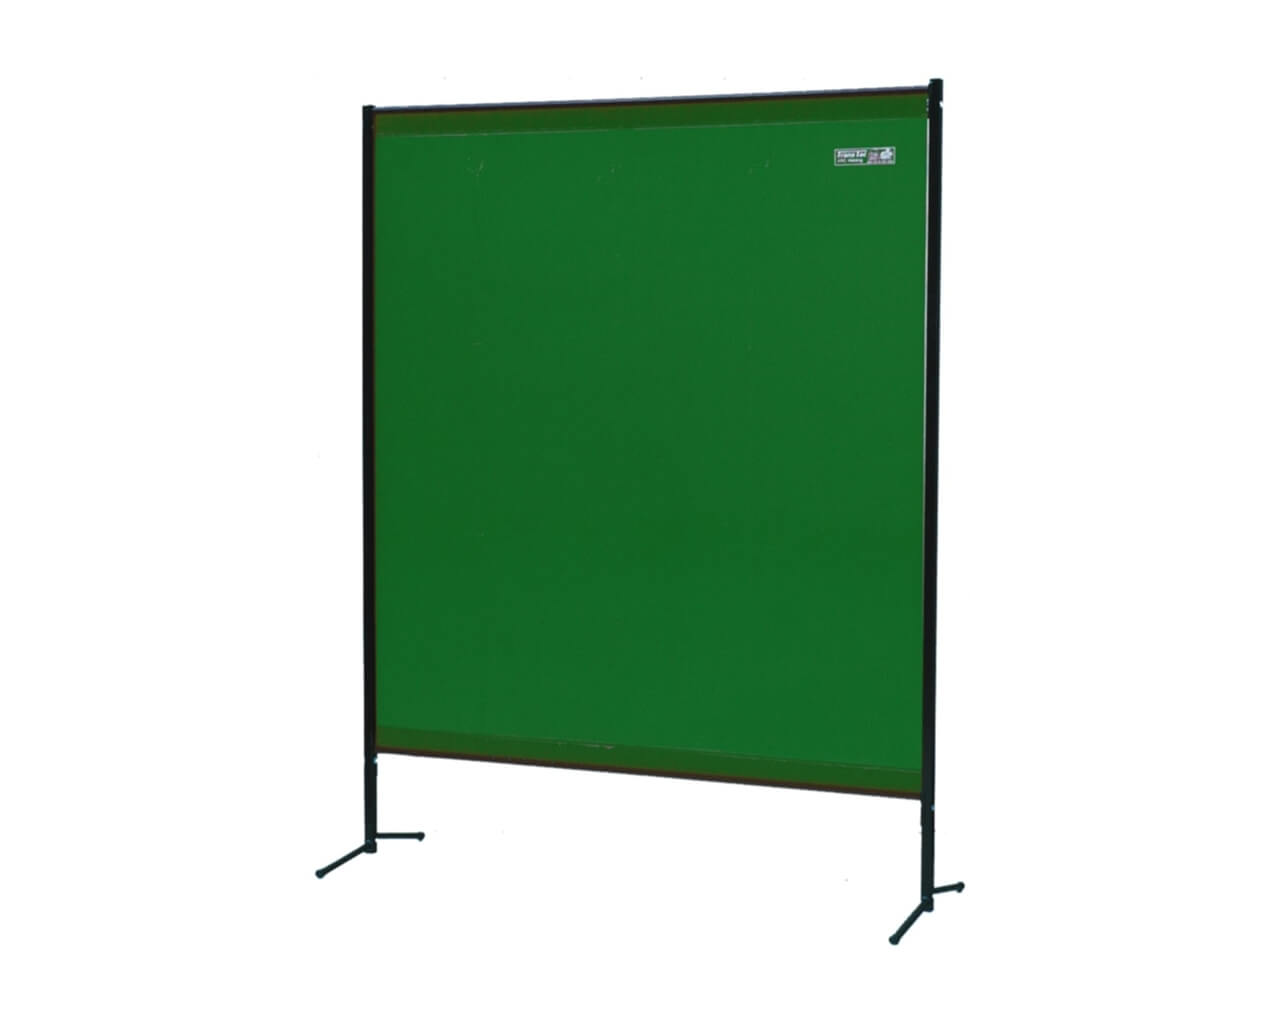 Schutzwand TSW-1 145x187cm (Eurogrün)